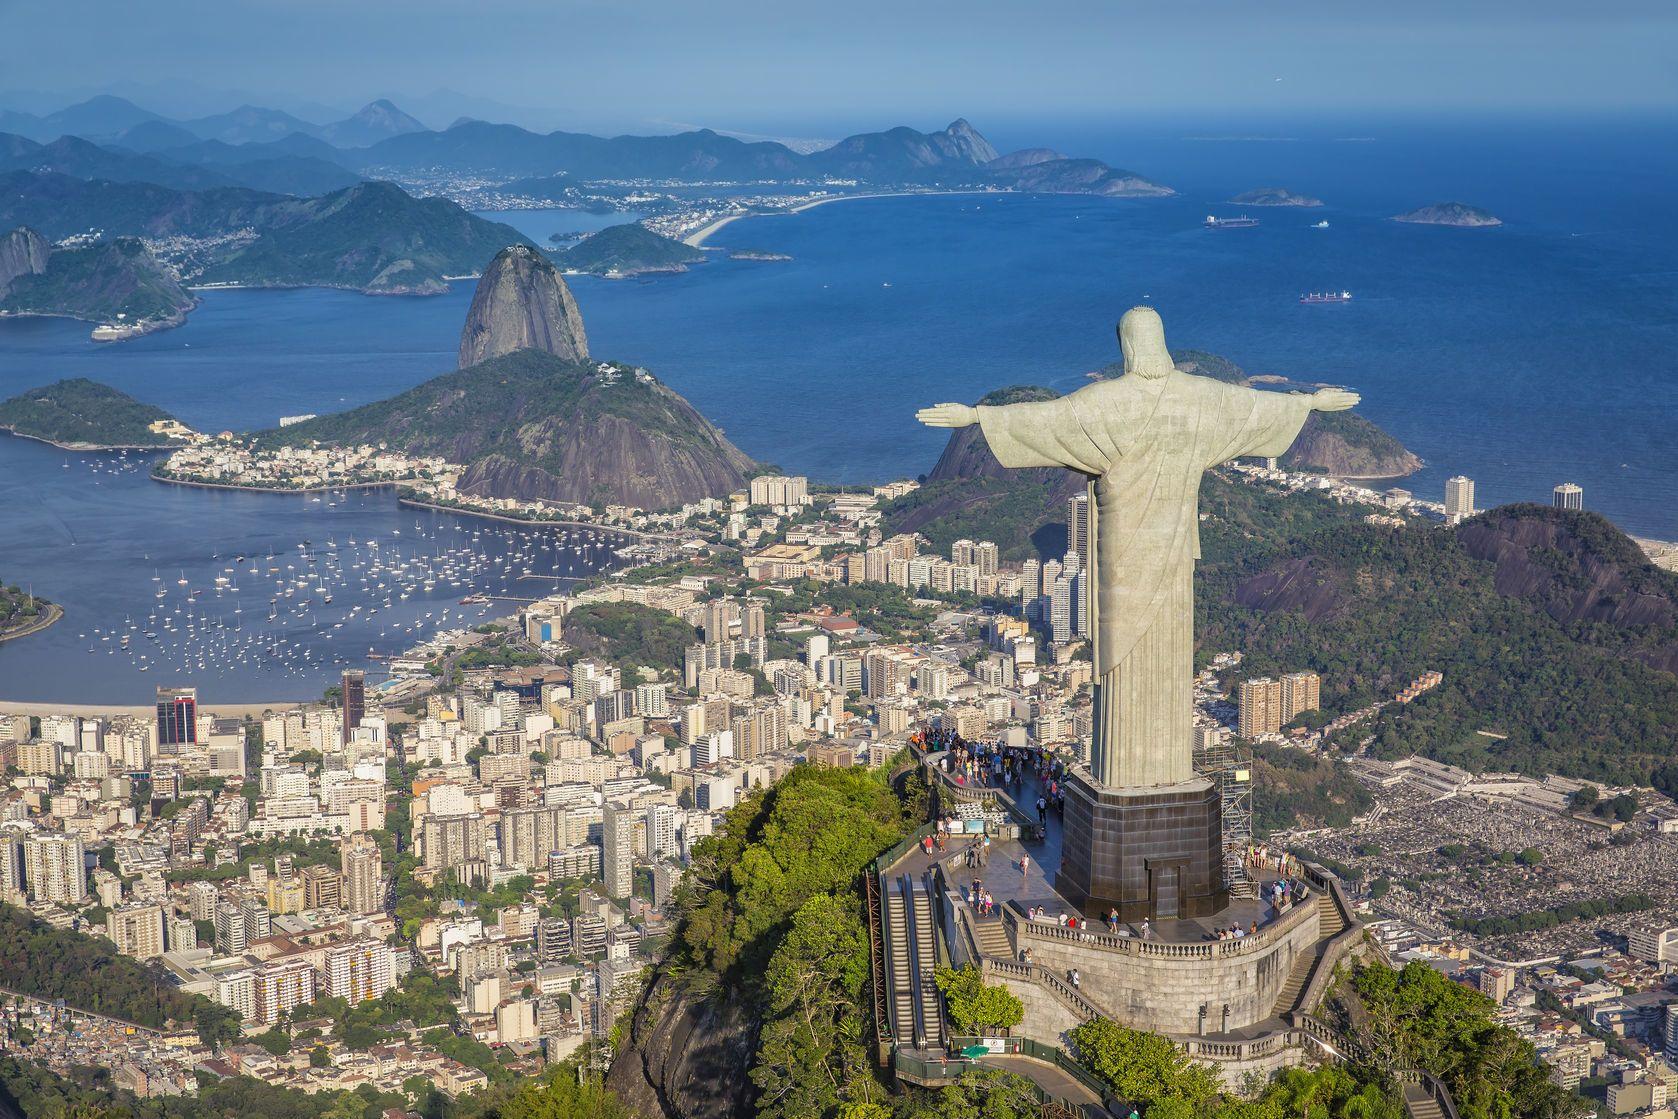 Letecký pohled na Rio De Janeiro v Brazílii | marchello74/123RF.com